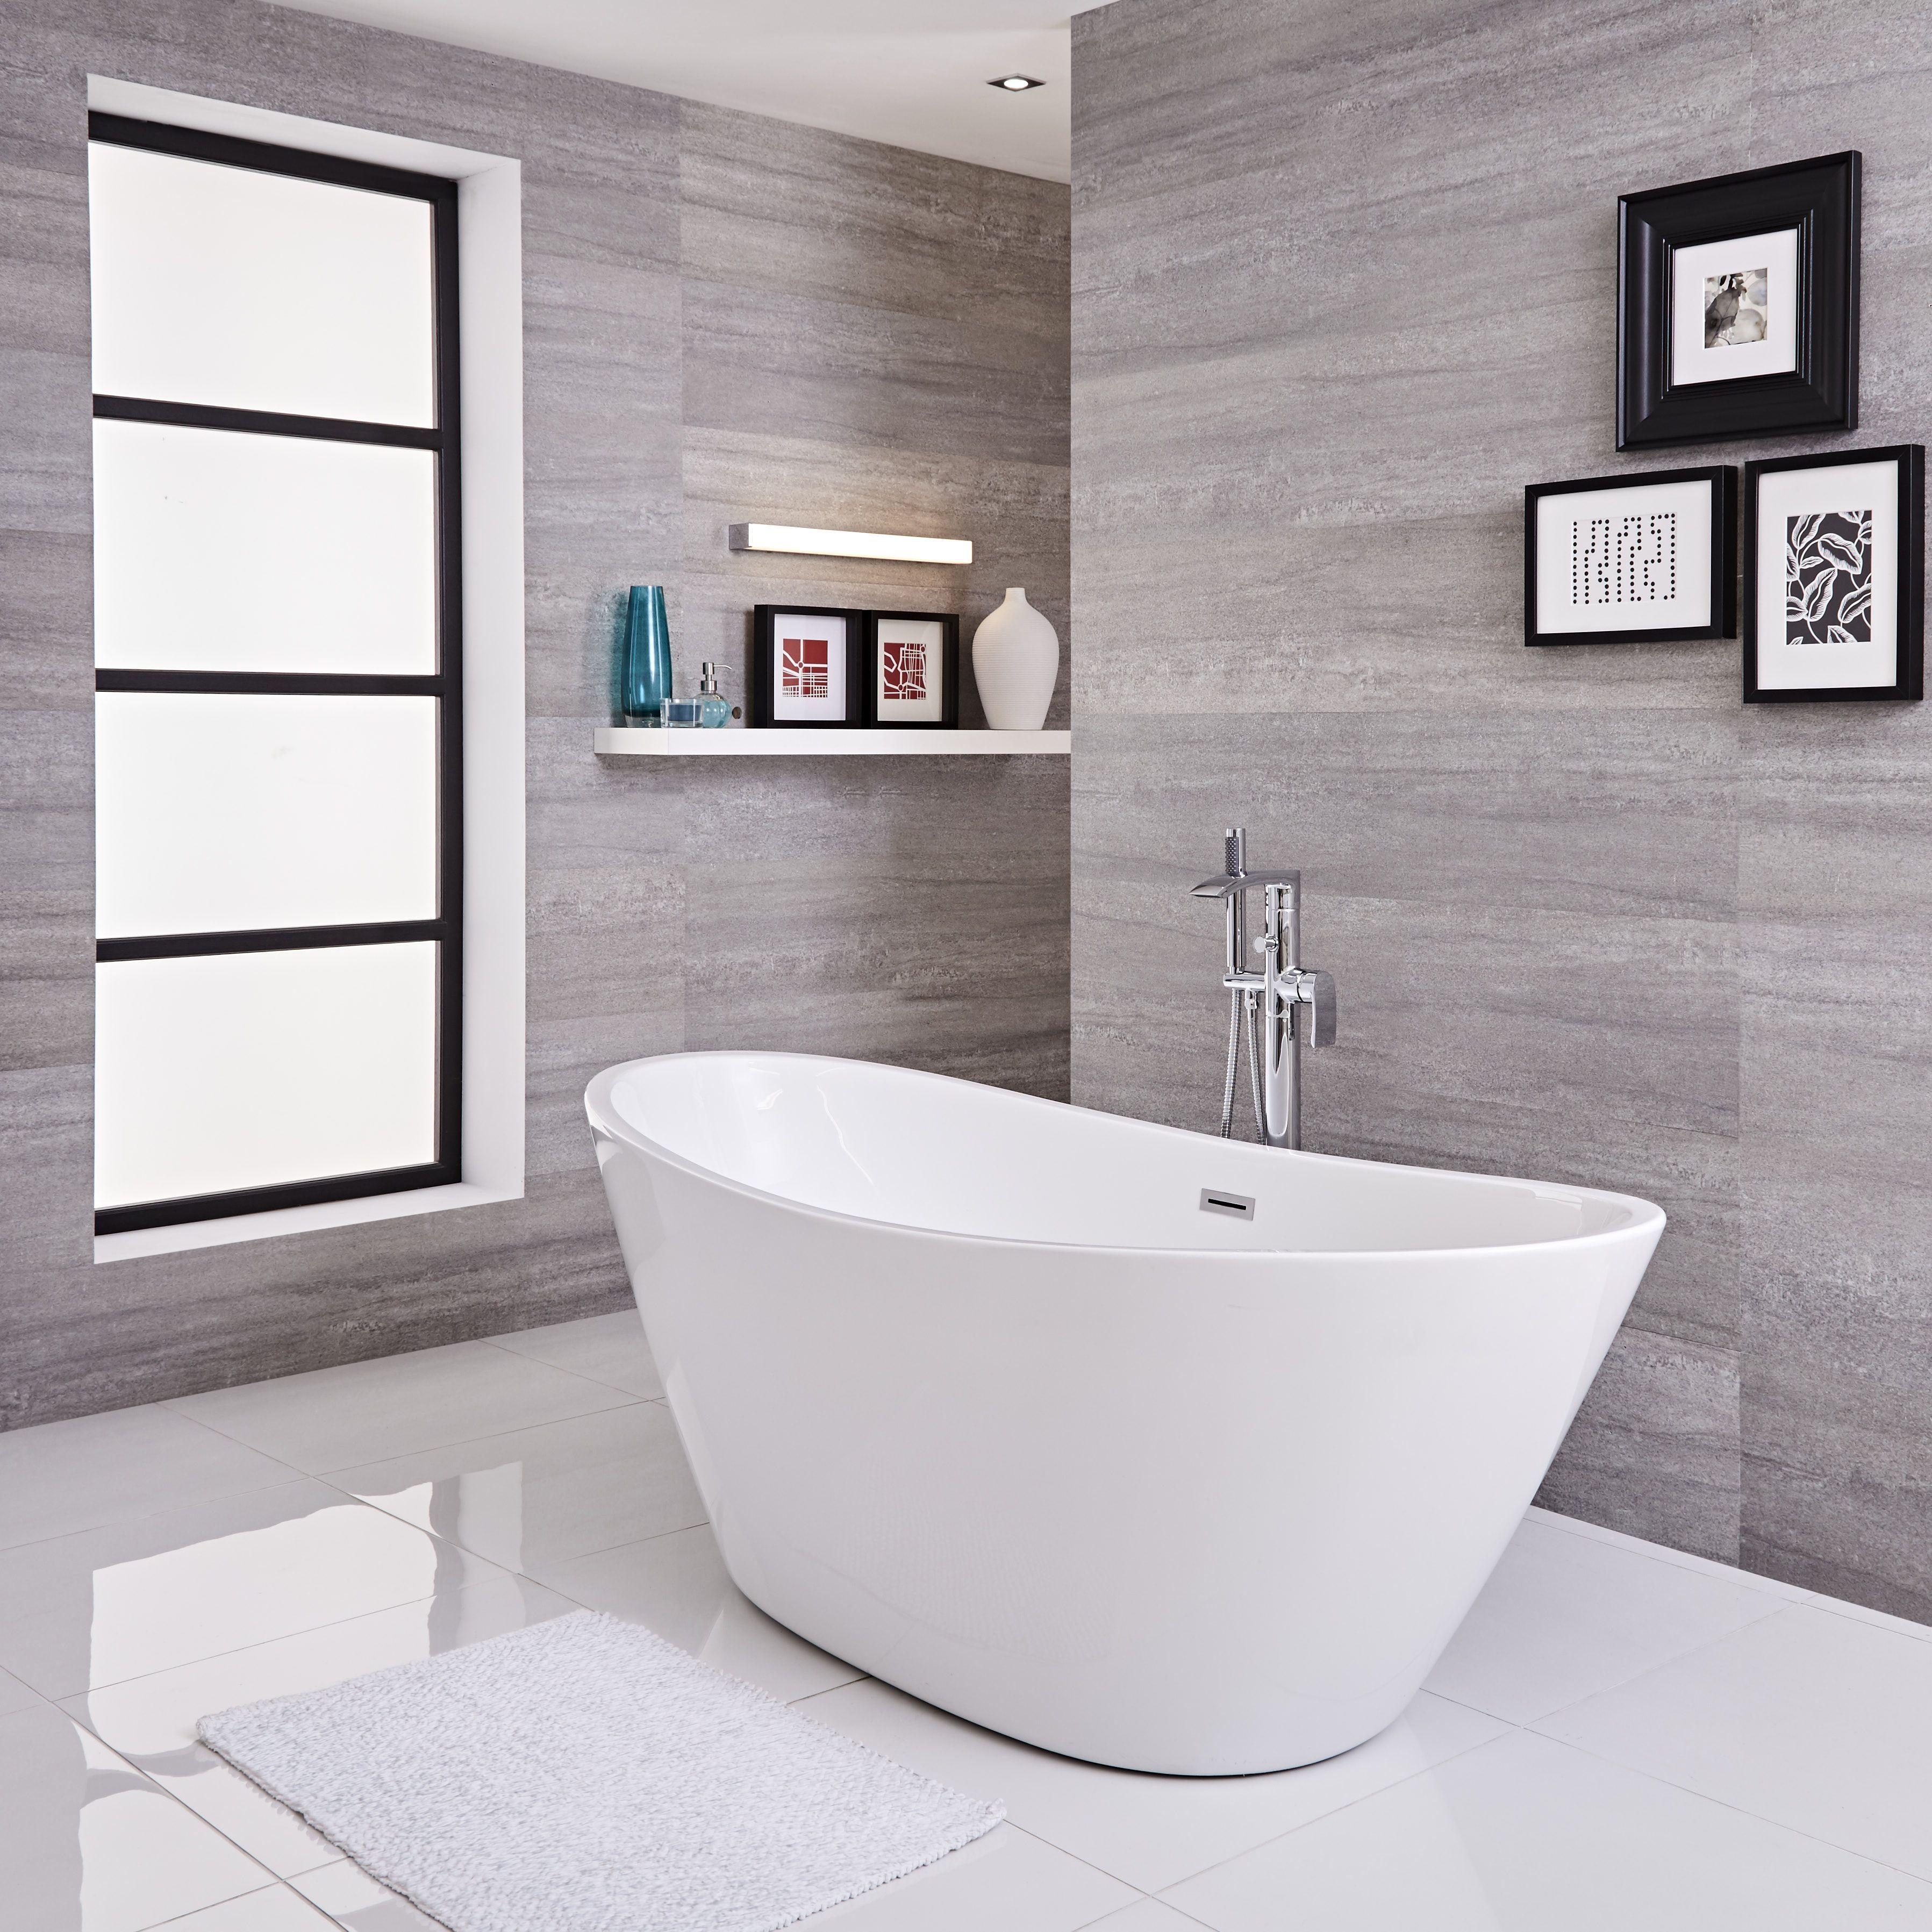 38++ Salle de bain ilot ideas in 2021